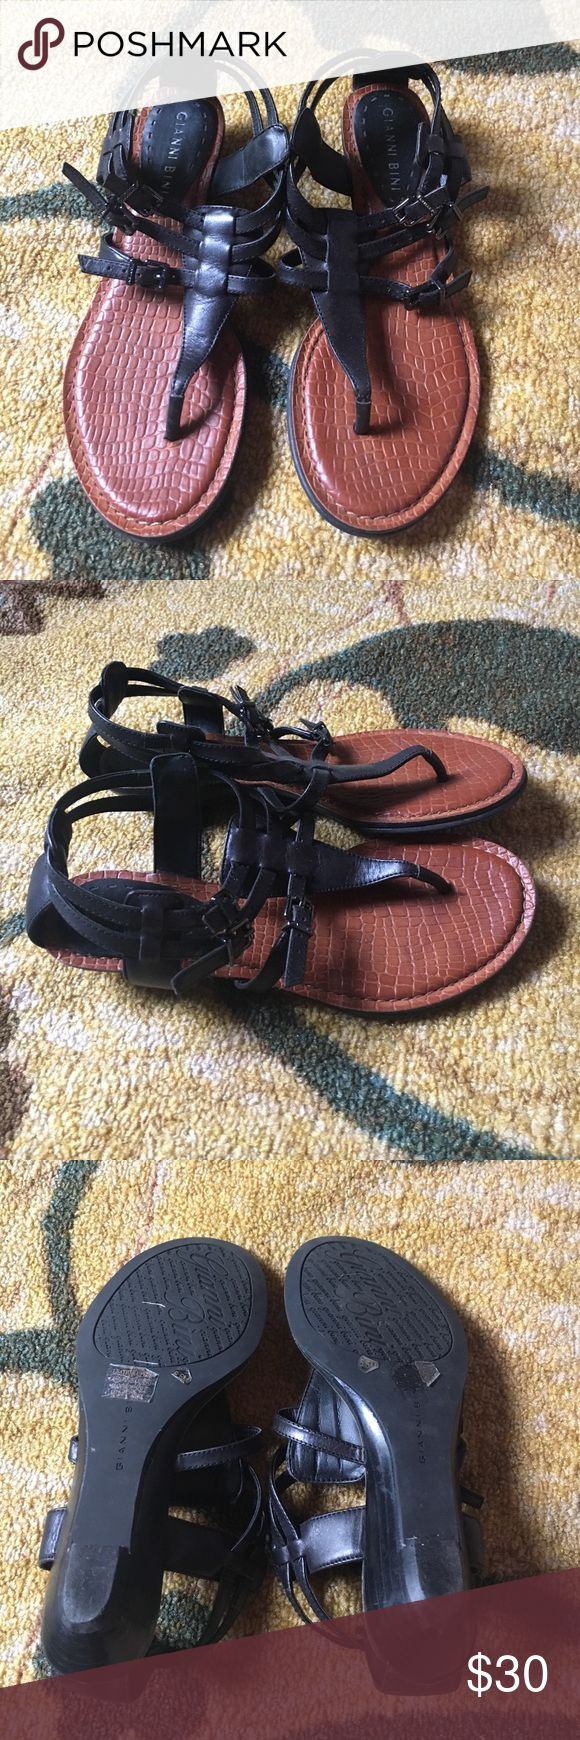 Gianni Bini Gladiator Sandals Worn a few times. Adjustable straps. Leather upper. Small wedge heel. Gianni Bini Shoes Sandals